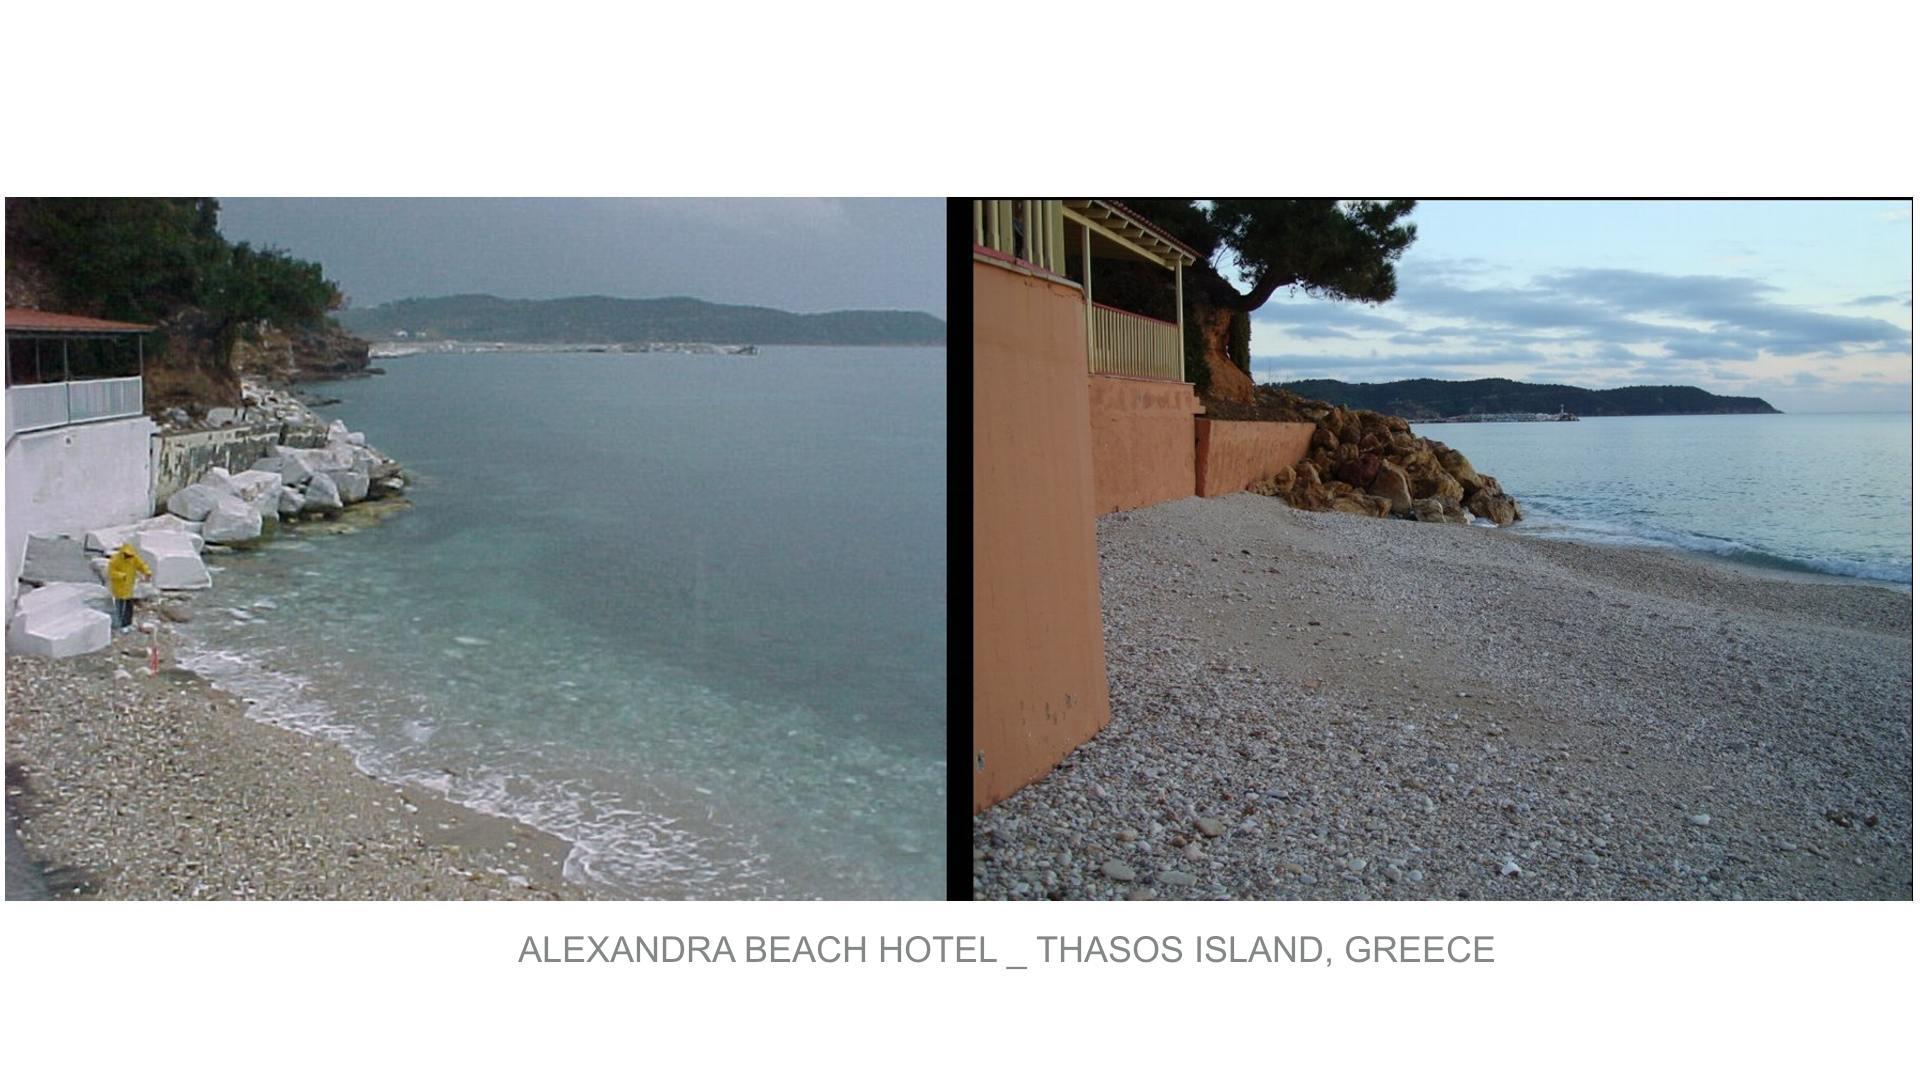 alexandra_beach_HOTEL_WALL_1920x1080